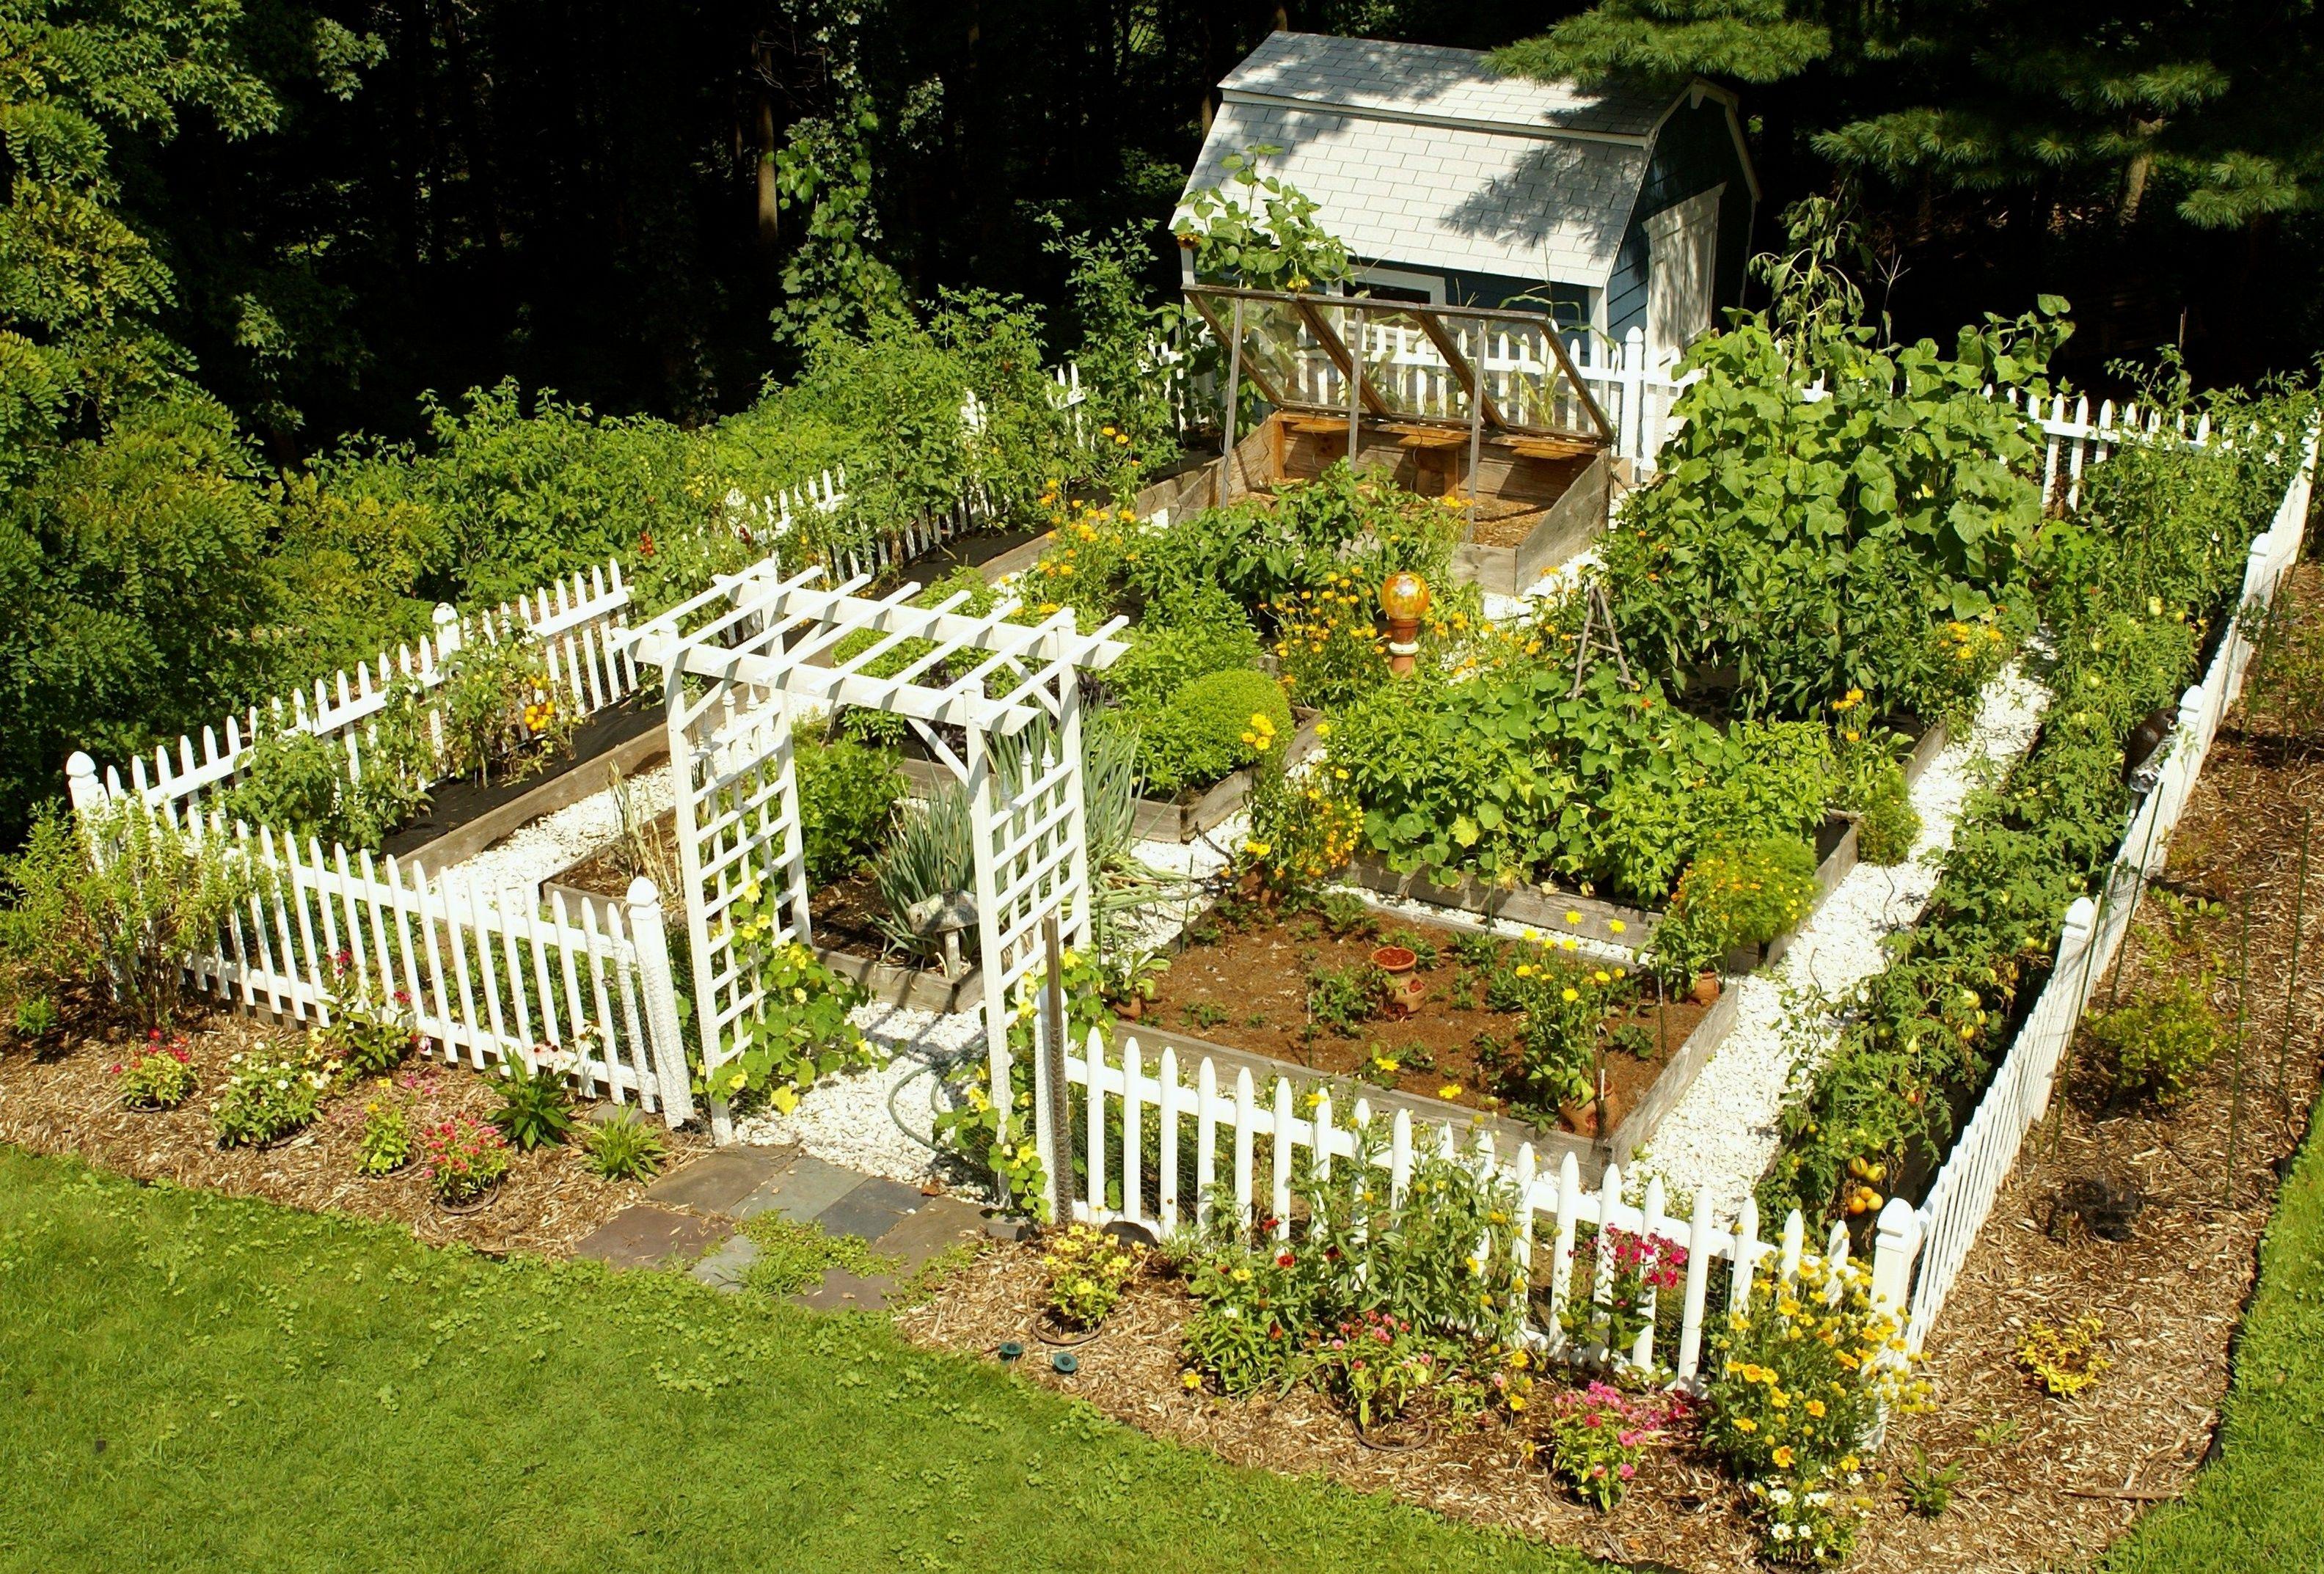 Home vegetable garden design  setting up a home vegetable garden vegetablegardening  Vegetable